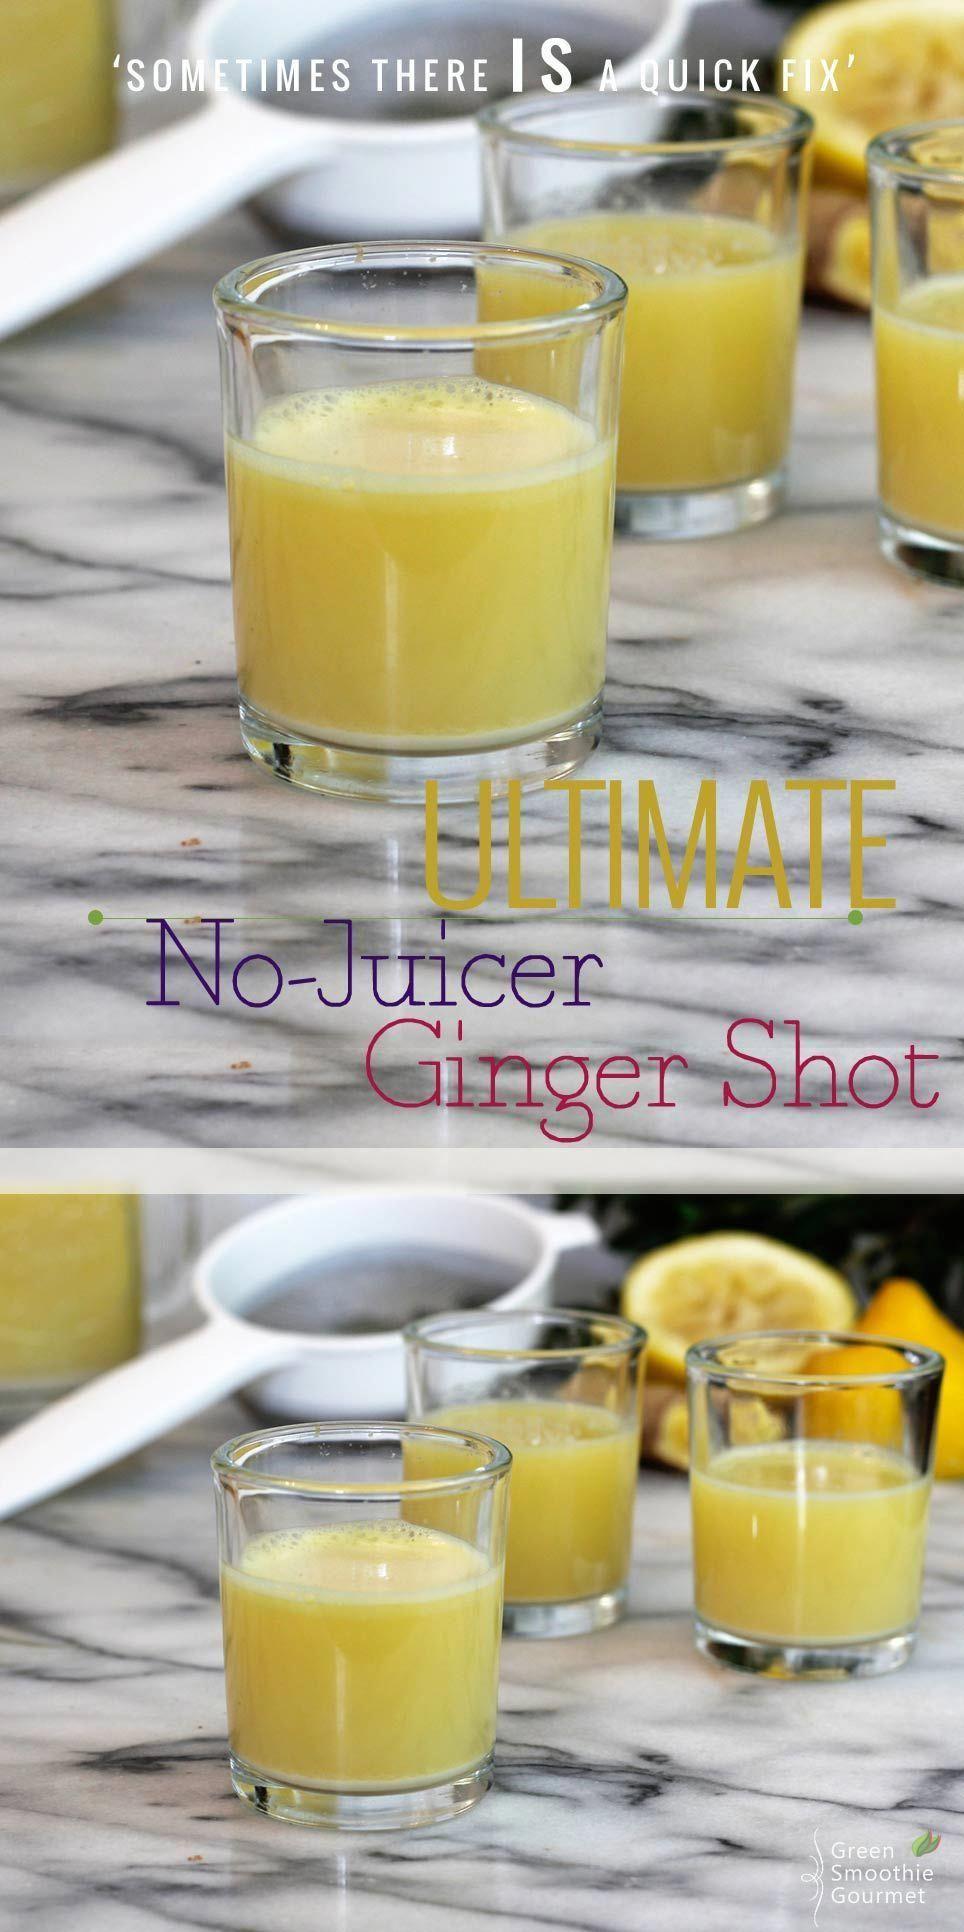 GingerLemon Shots Blender Recipe Sometimes there IS a